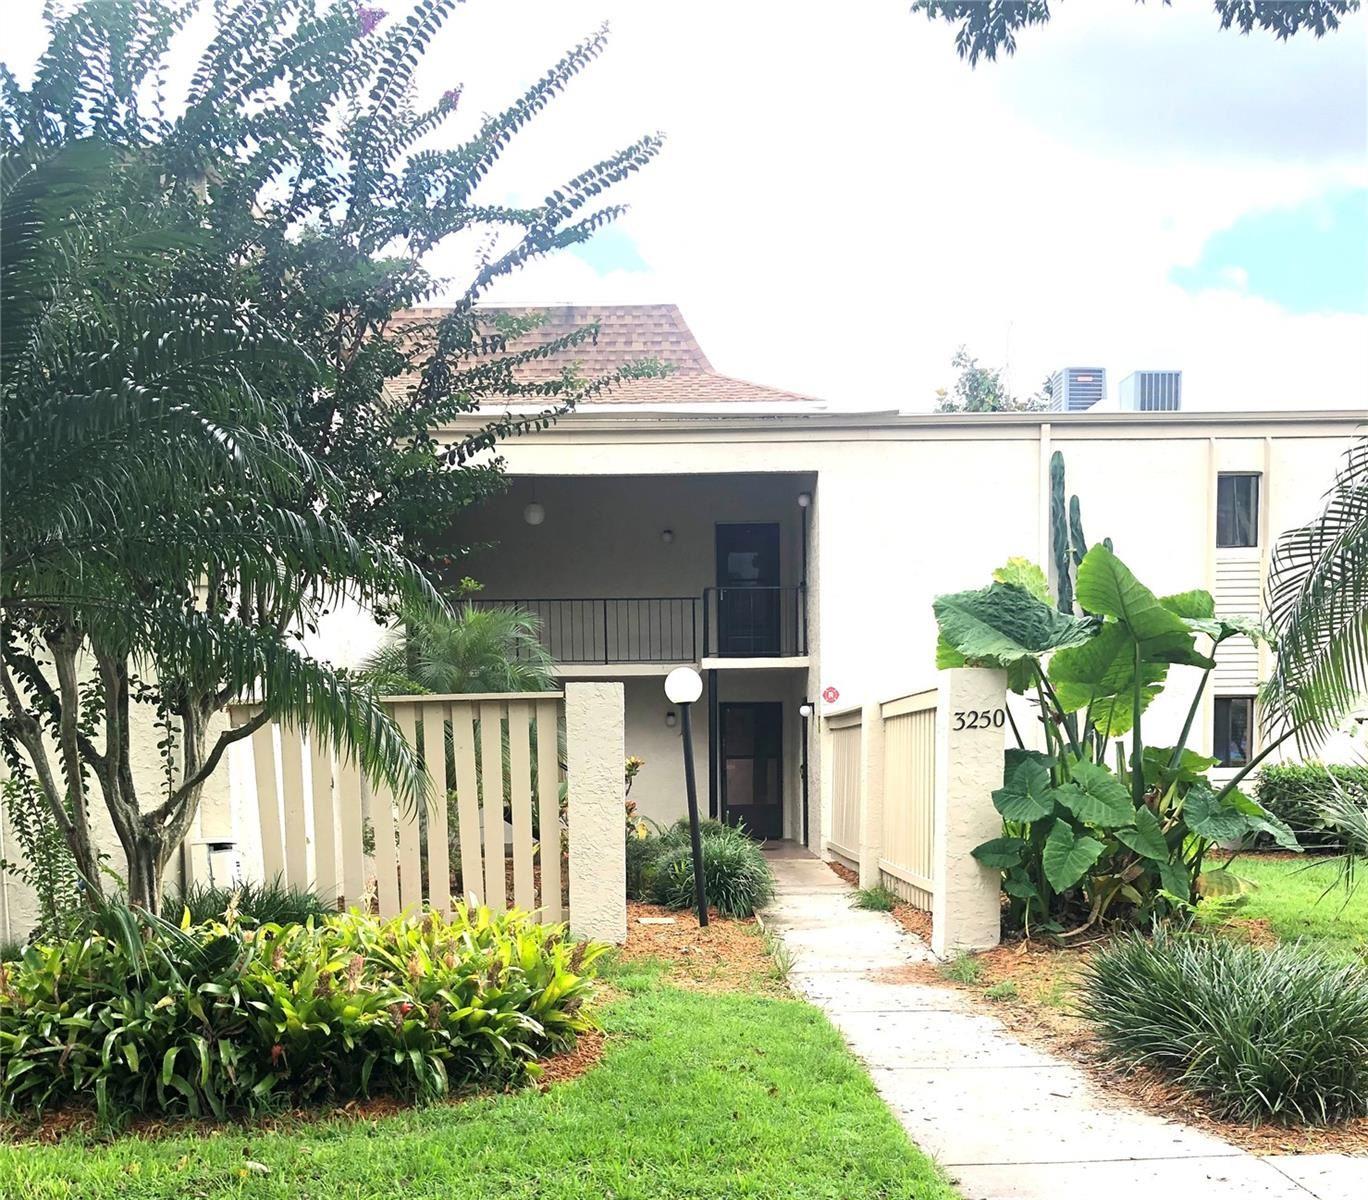 3250 S SEMORAN BOULEVARD #25, Orlando, FL 32822 - #: O5964731